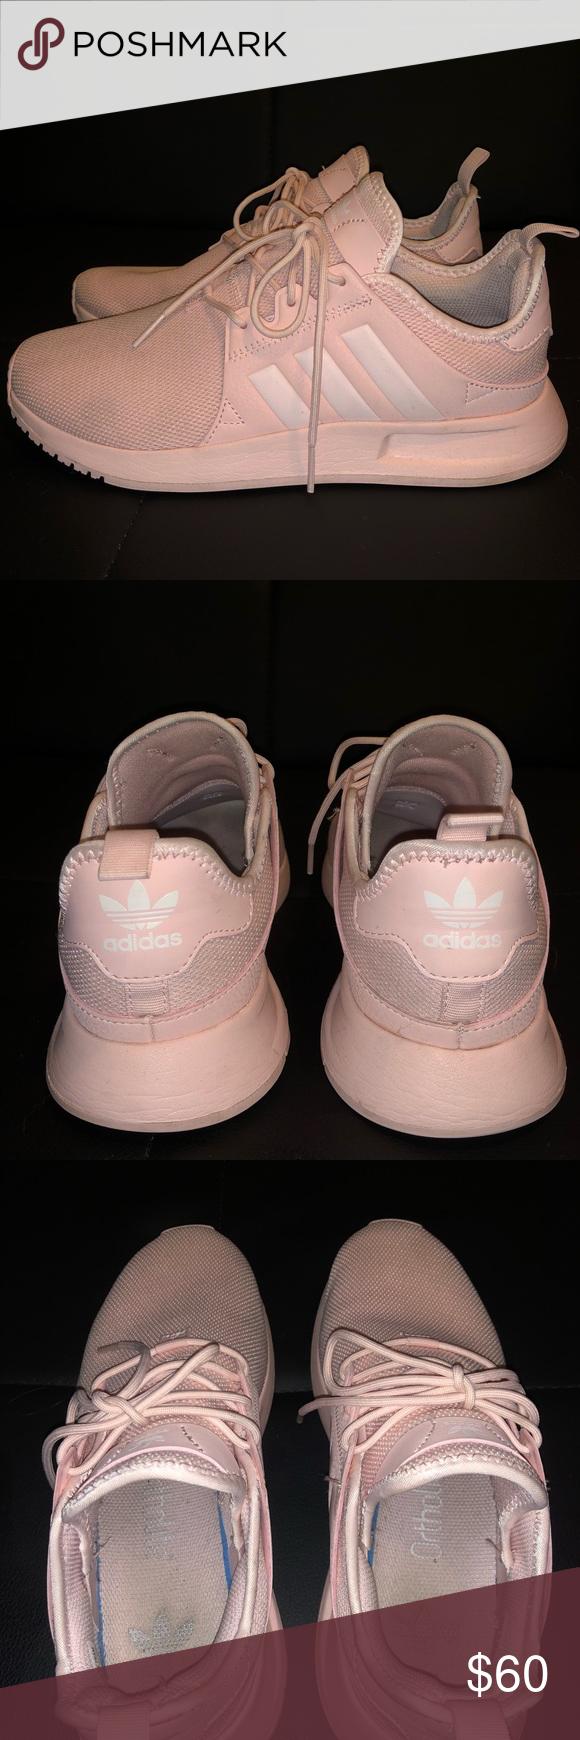 Girls Adidas Originals X_PLR Casual